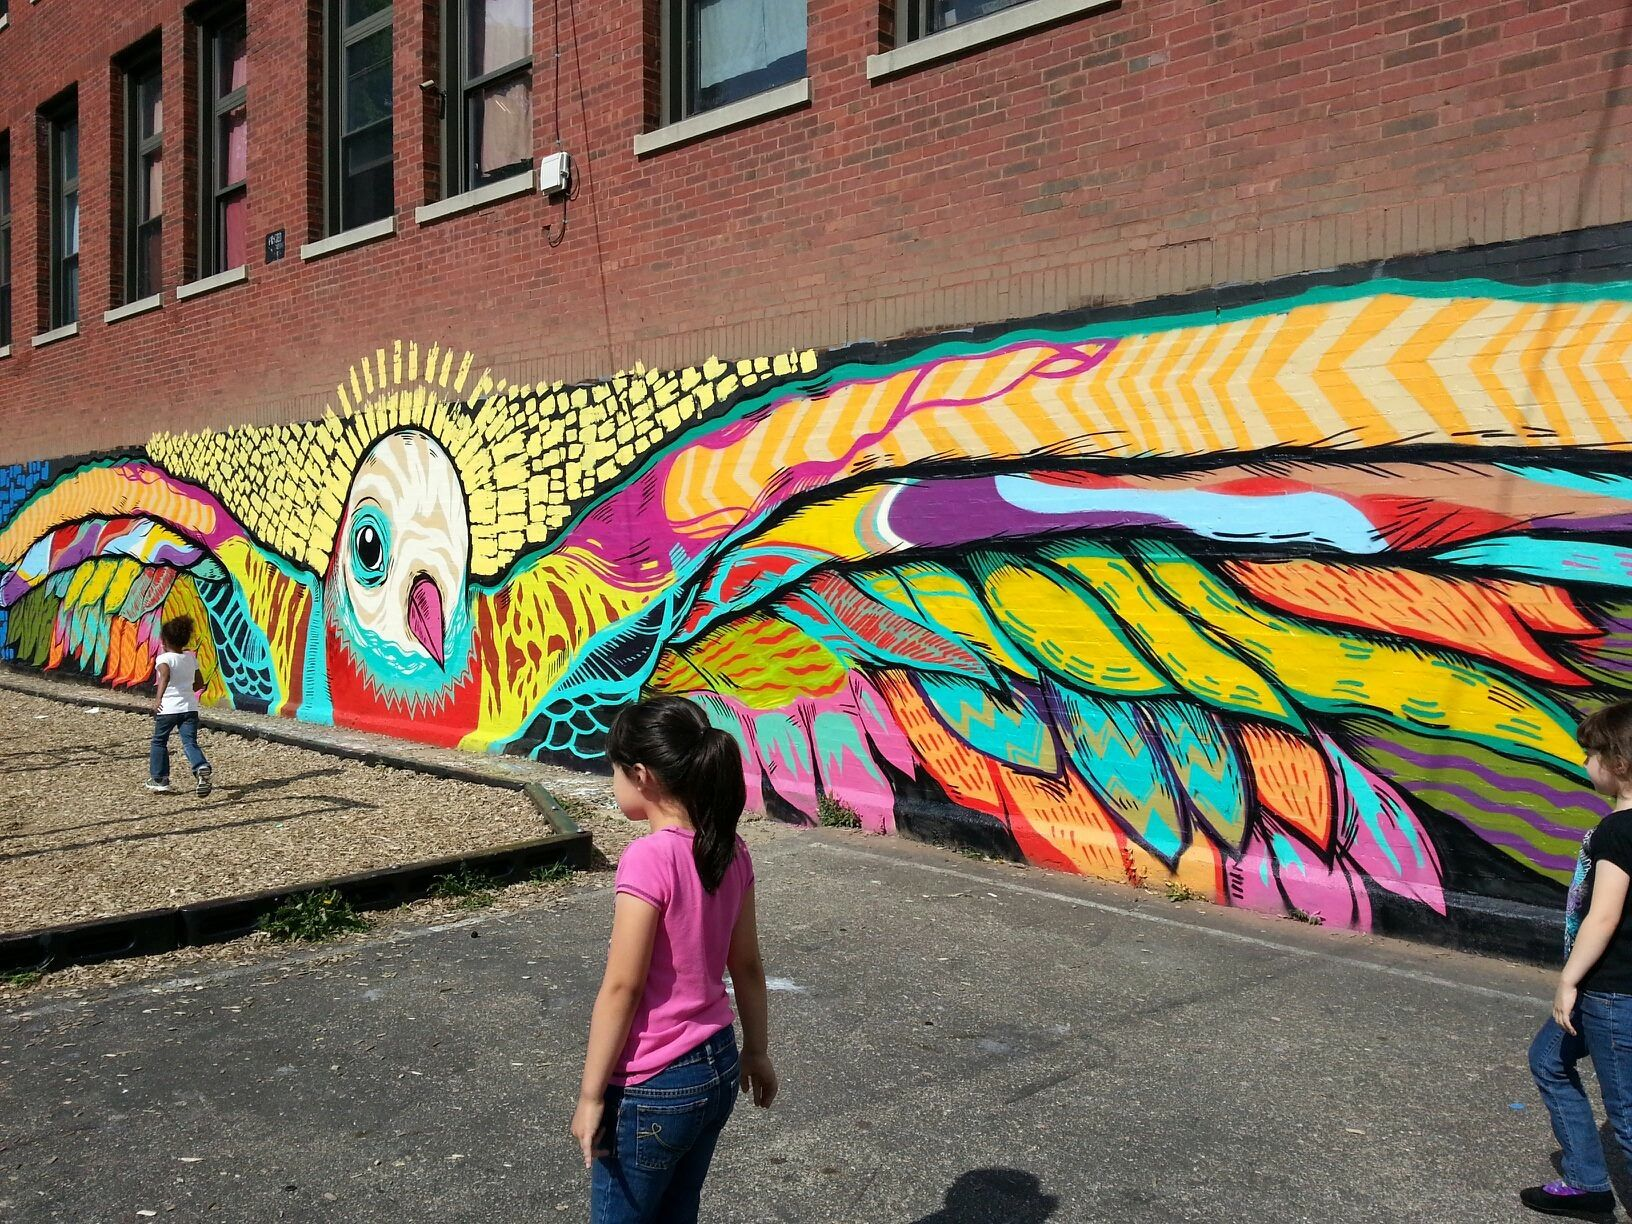 Playground Mural By Joseph Sentrock Perez Located In Chicago S Little Village Neighborhood Street Art Graffiti Murals Outdoor Art